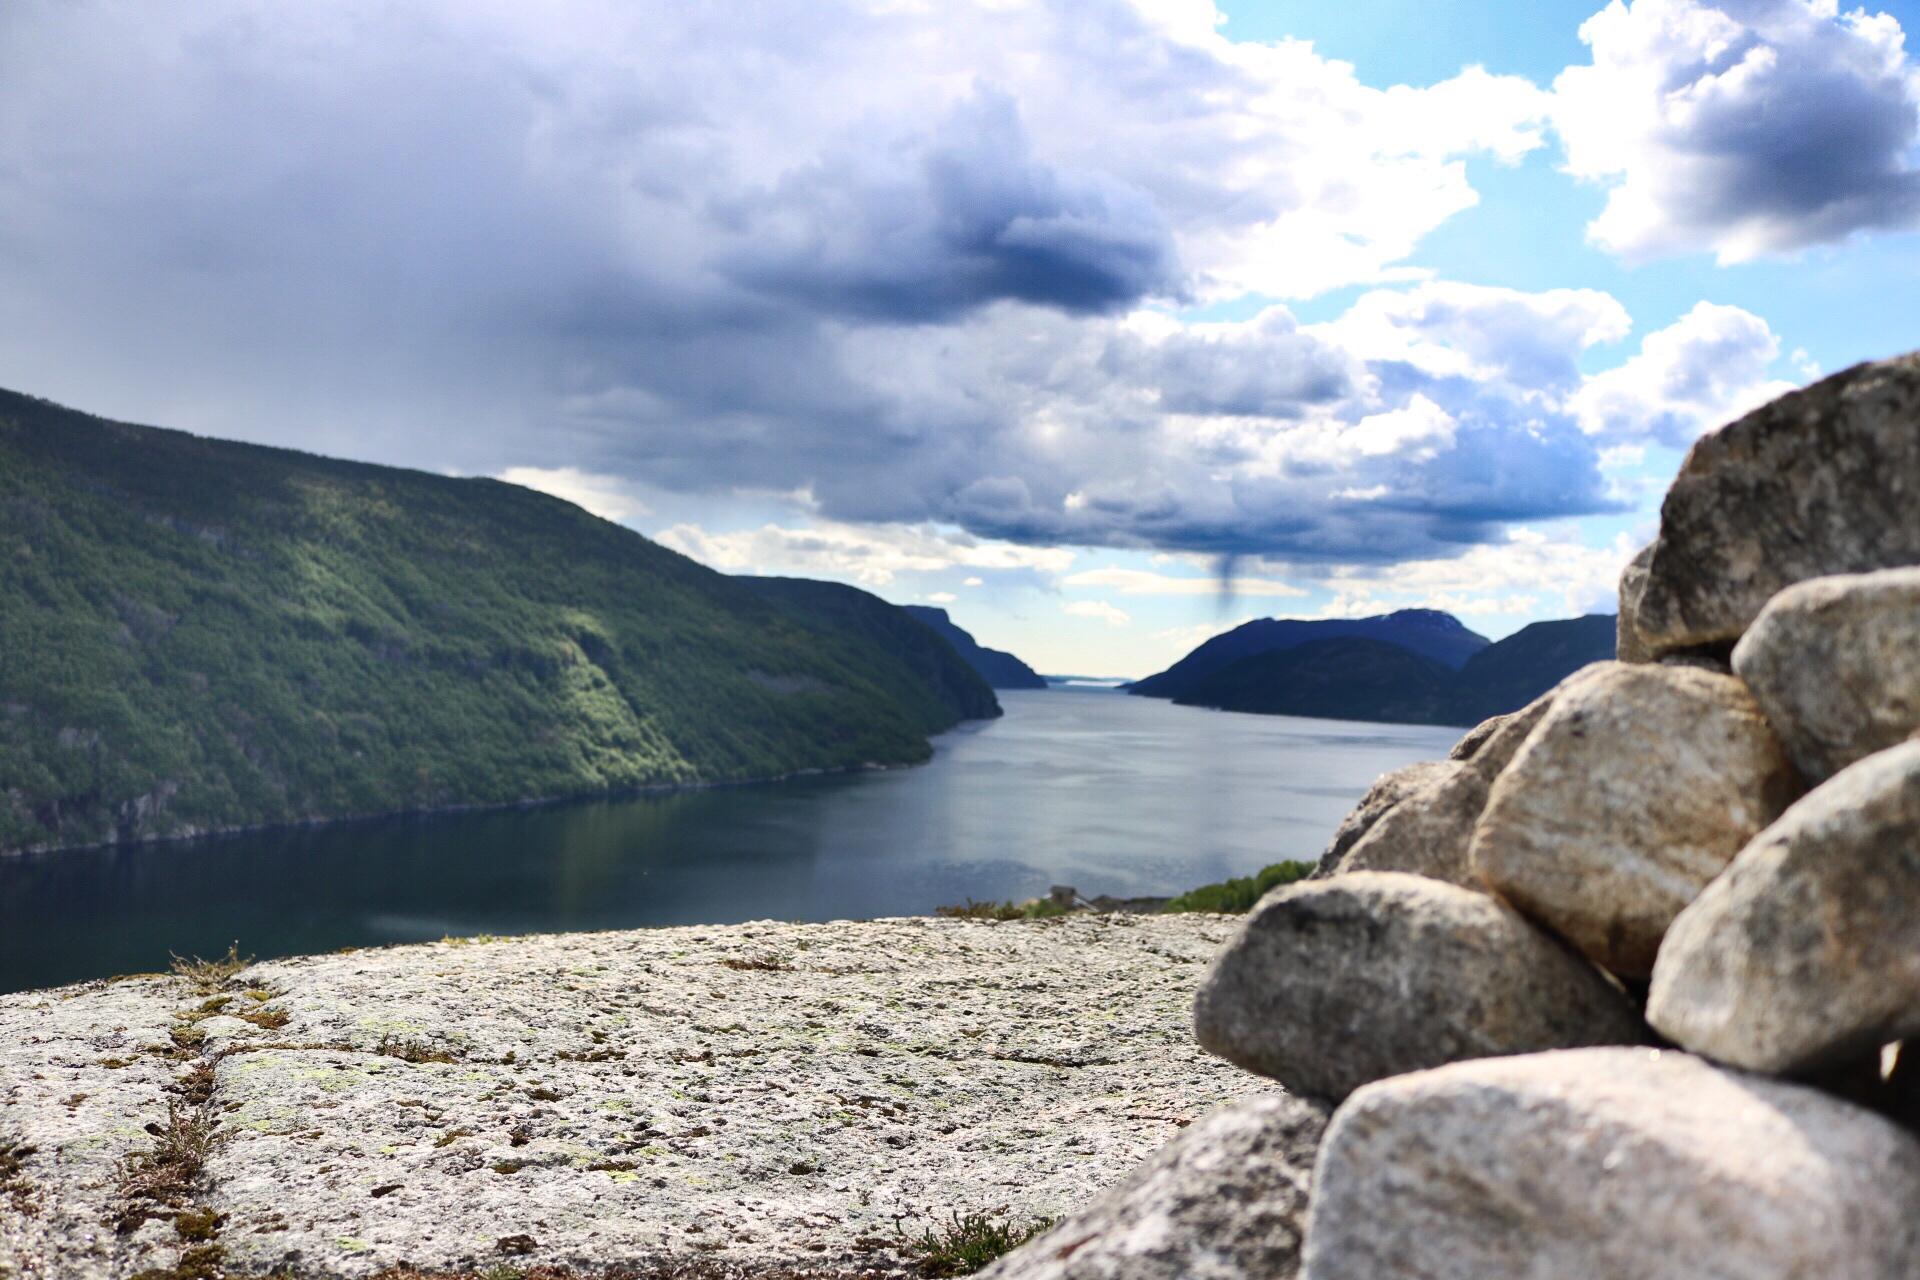 Top Wallpaper Mountain Grey - sea-mountain-Norway-rock-Canon-landscape-grey-norge-outdoor-Formation-1855mm-orry-rogaland-hjelmeland-j-senfjorden-750d-seglet-iglatj-n-953529  Image_646688.jpg